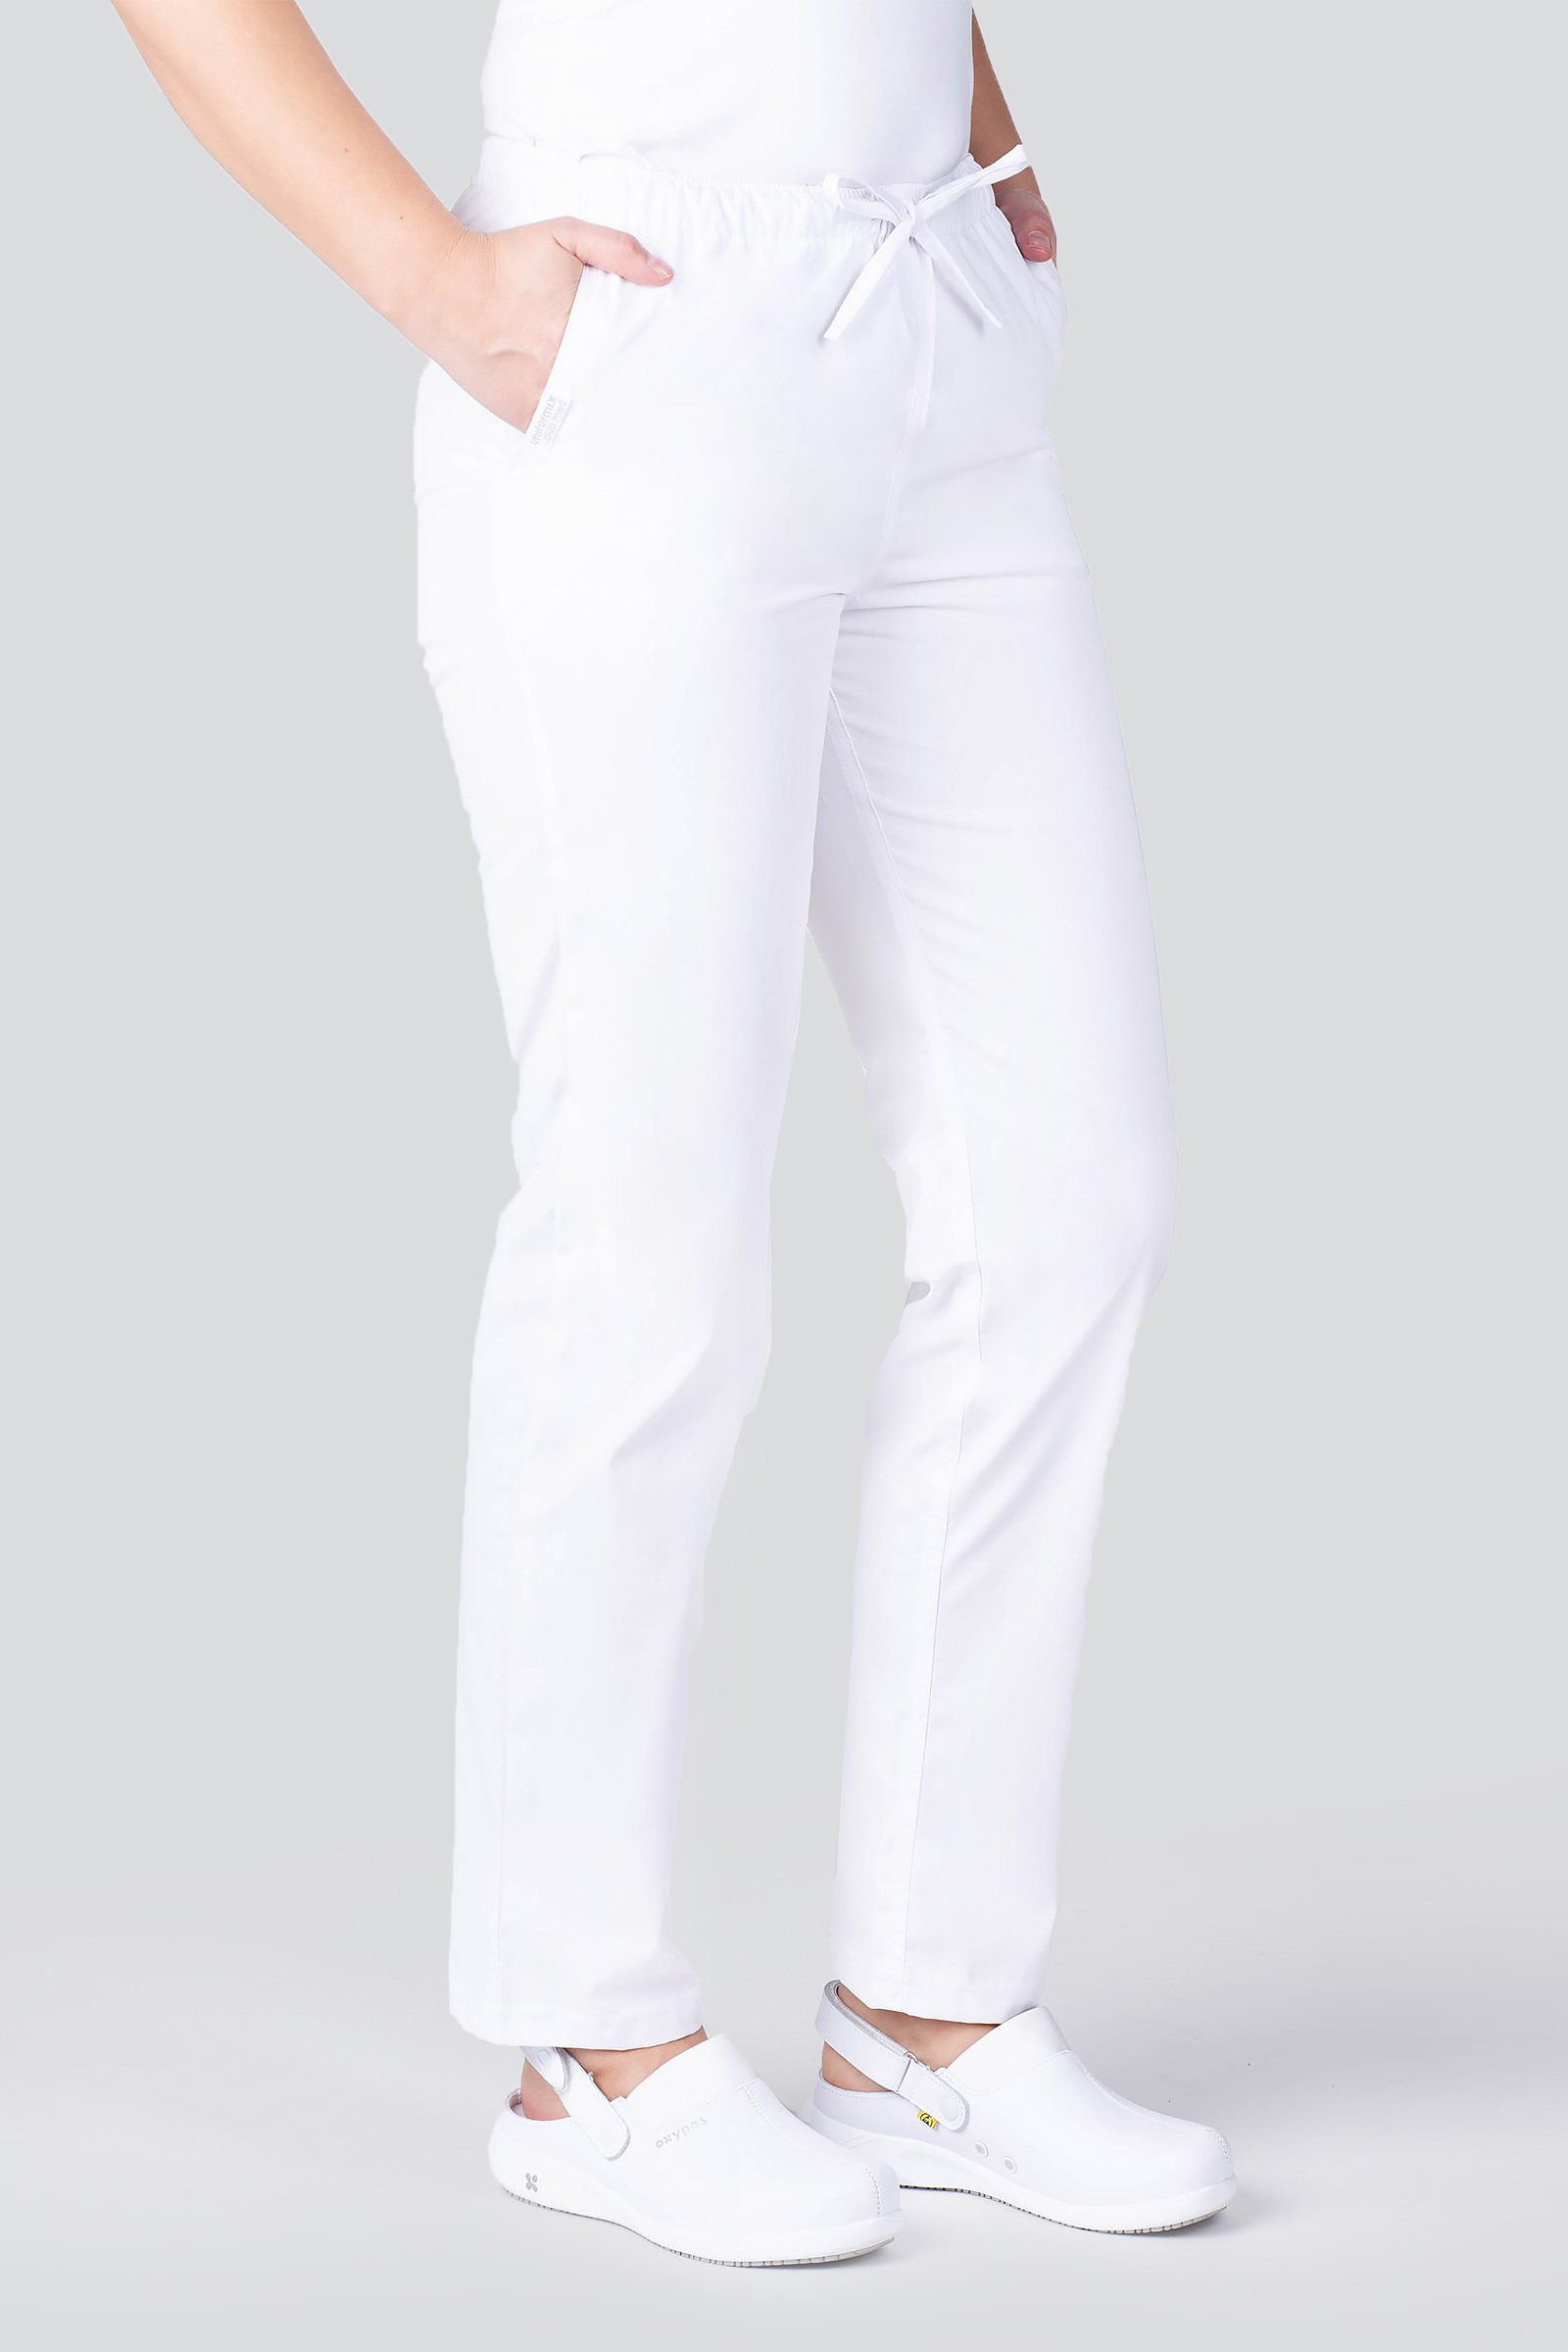 Medizinische Unisex Hose Uniformix Club Weiss Cm119 Weiss Medizinische Bekleidung Damen Bekleidung Medizinische Hosen Und Rocke Medizinische Bekleidung Herren Bekleidung Hosen Medizinkleidung Online Shop Uniformix